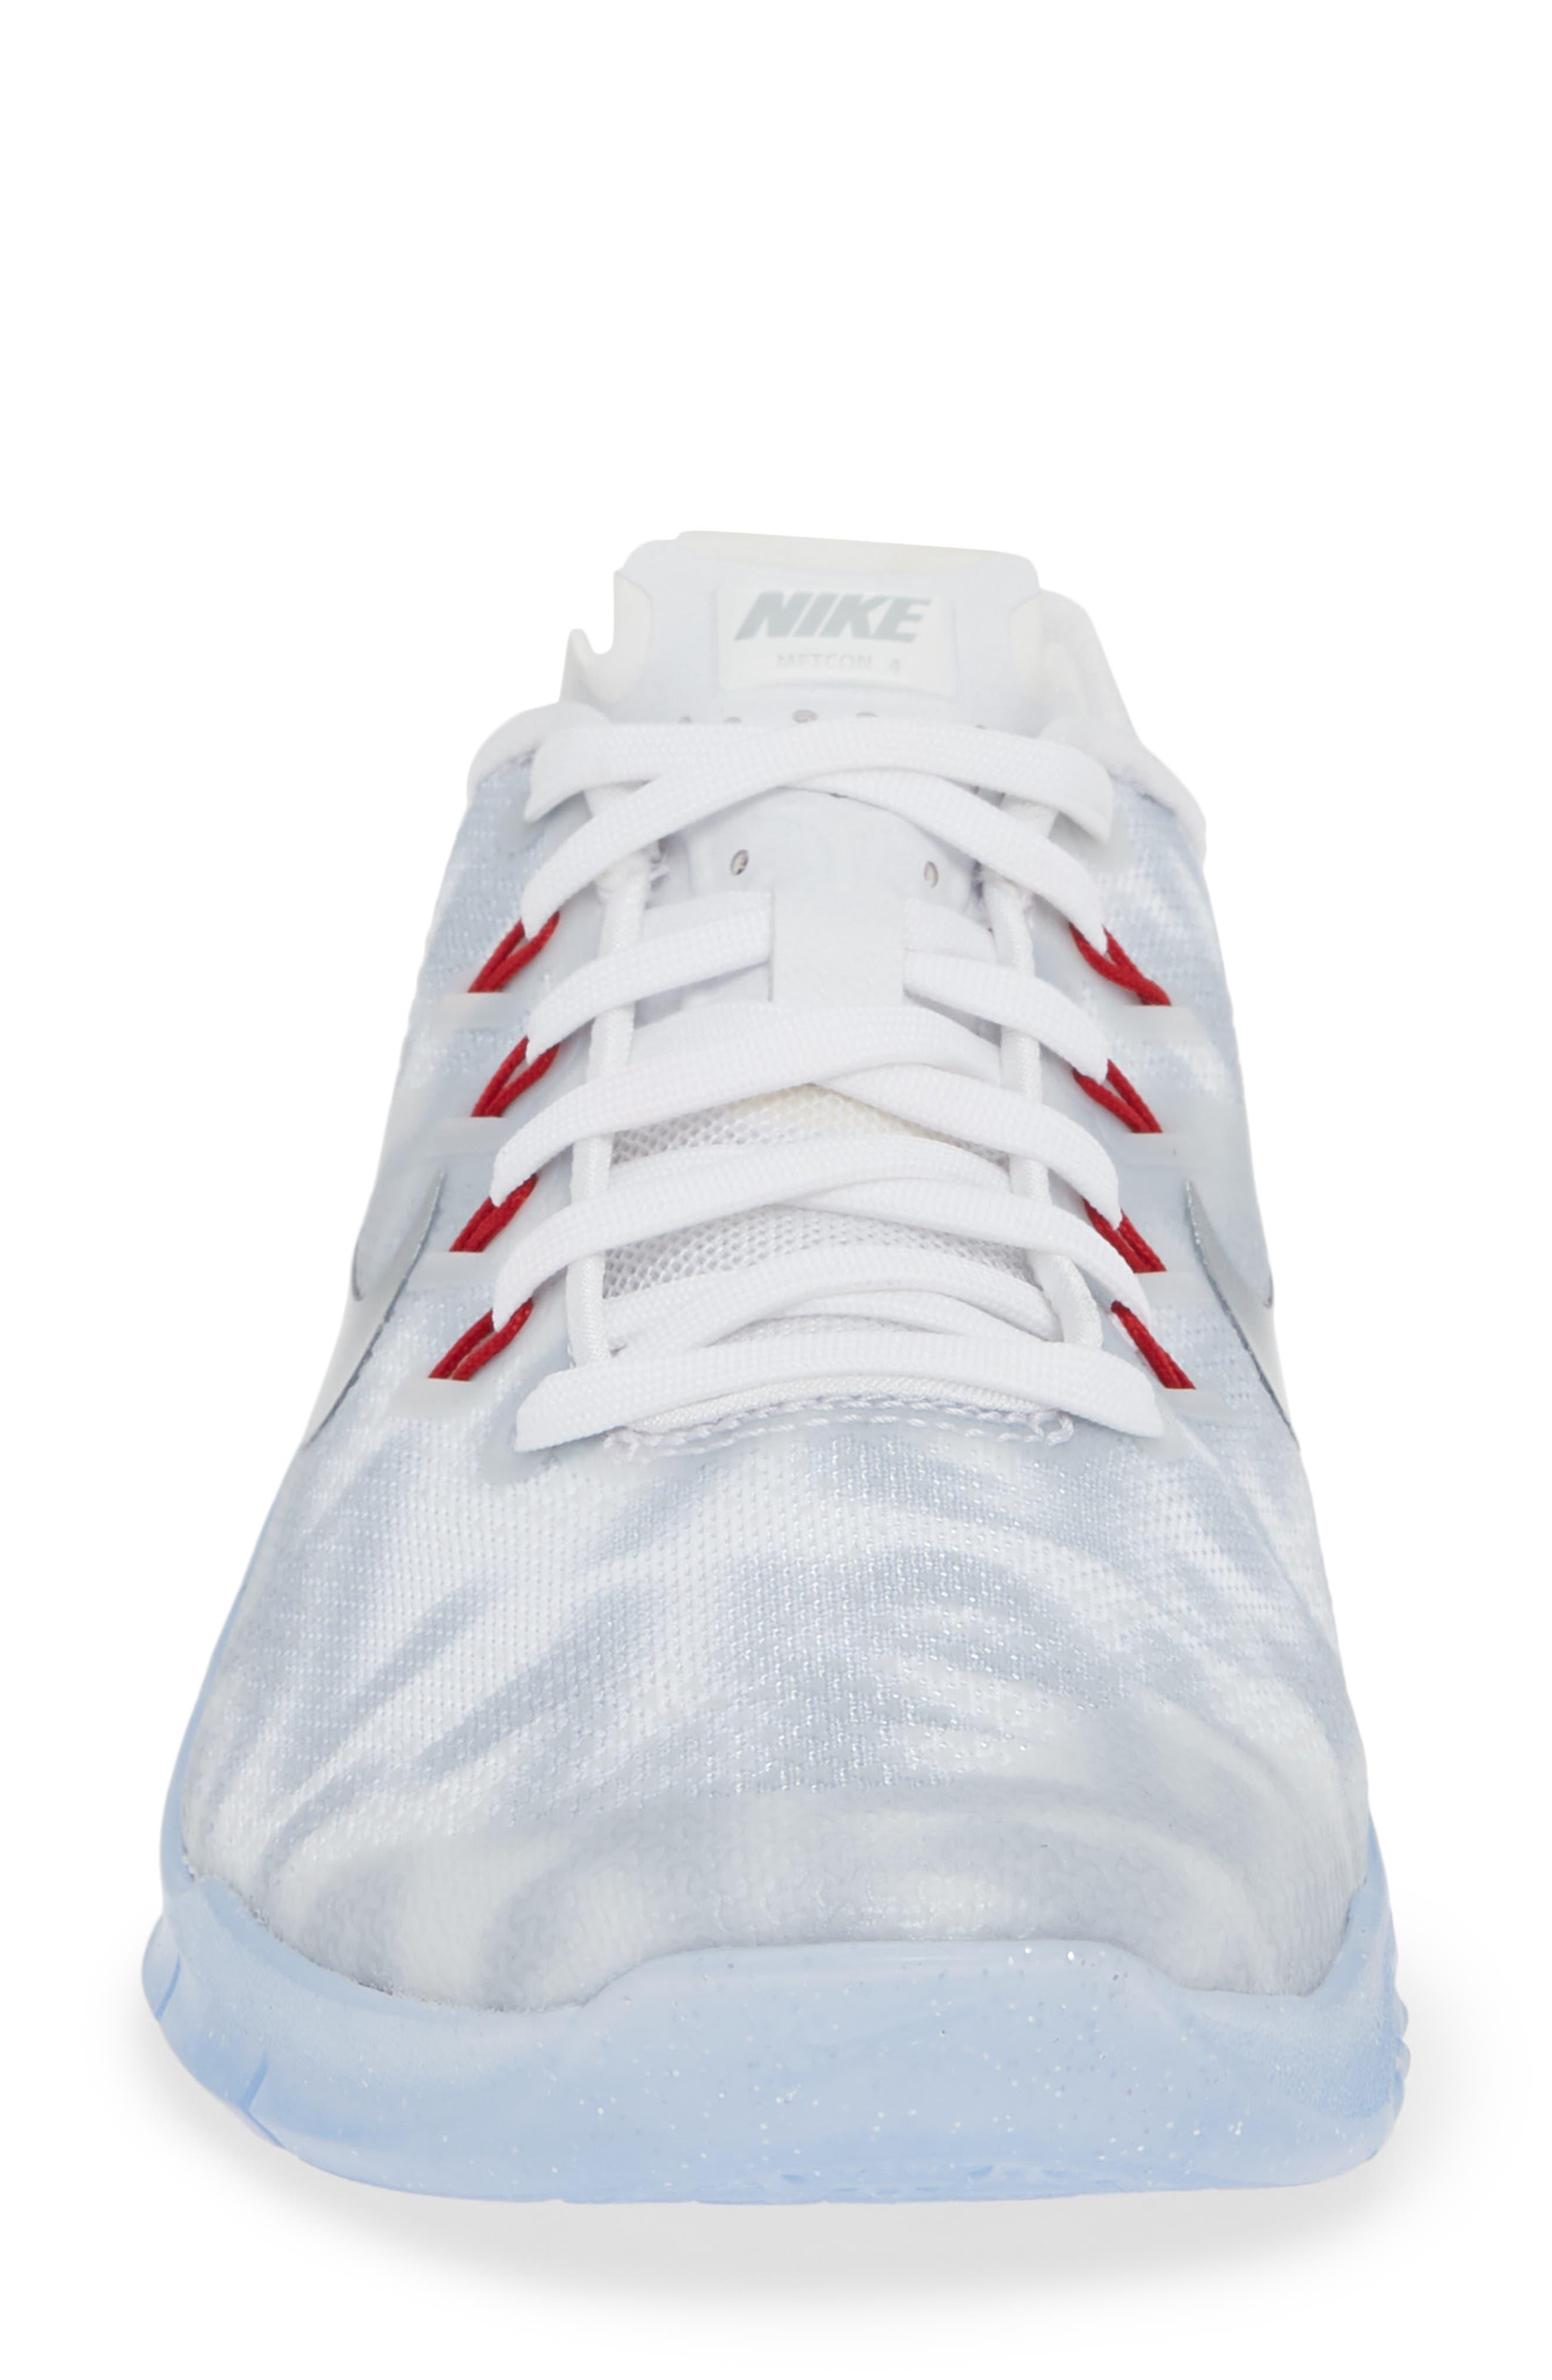 Metcon 4 Training Shoe,                             Alternate thumbnail 4, color,                             WHITE METALLIC SILVER/ GYM RED